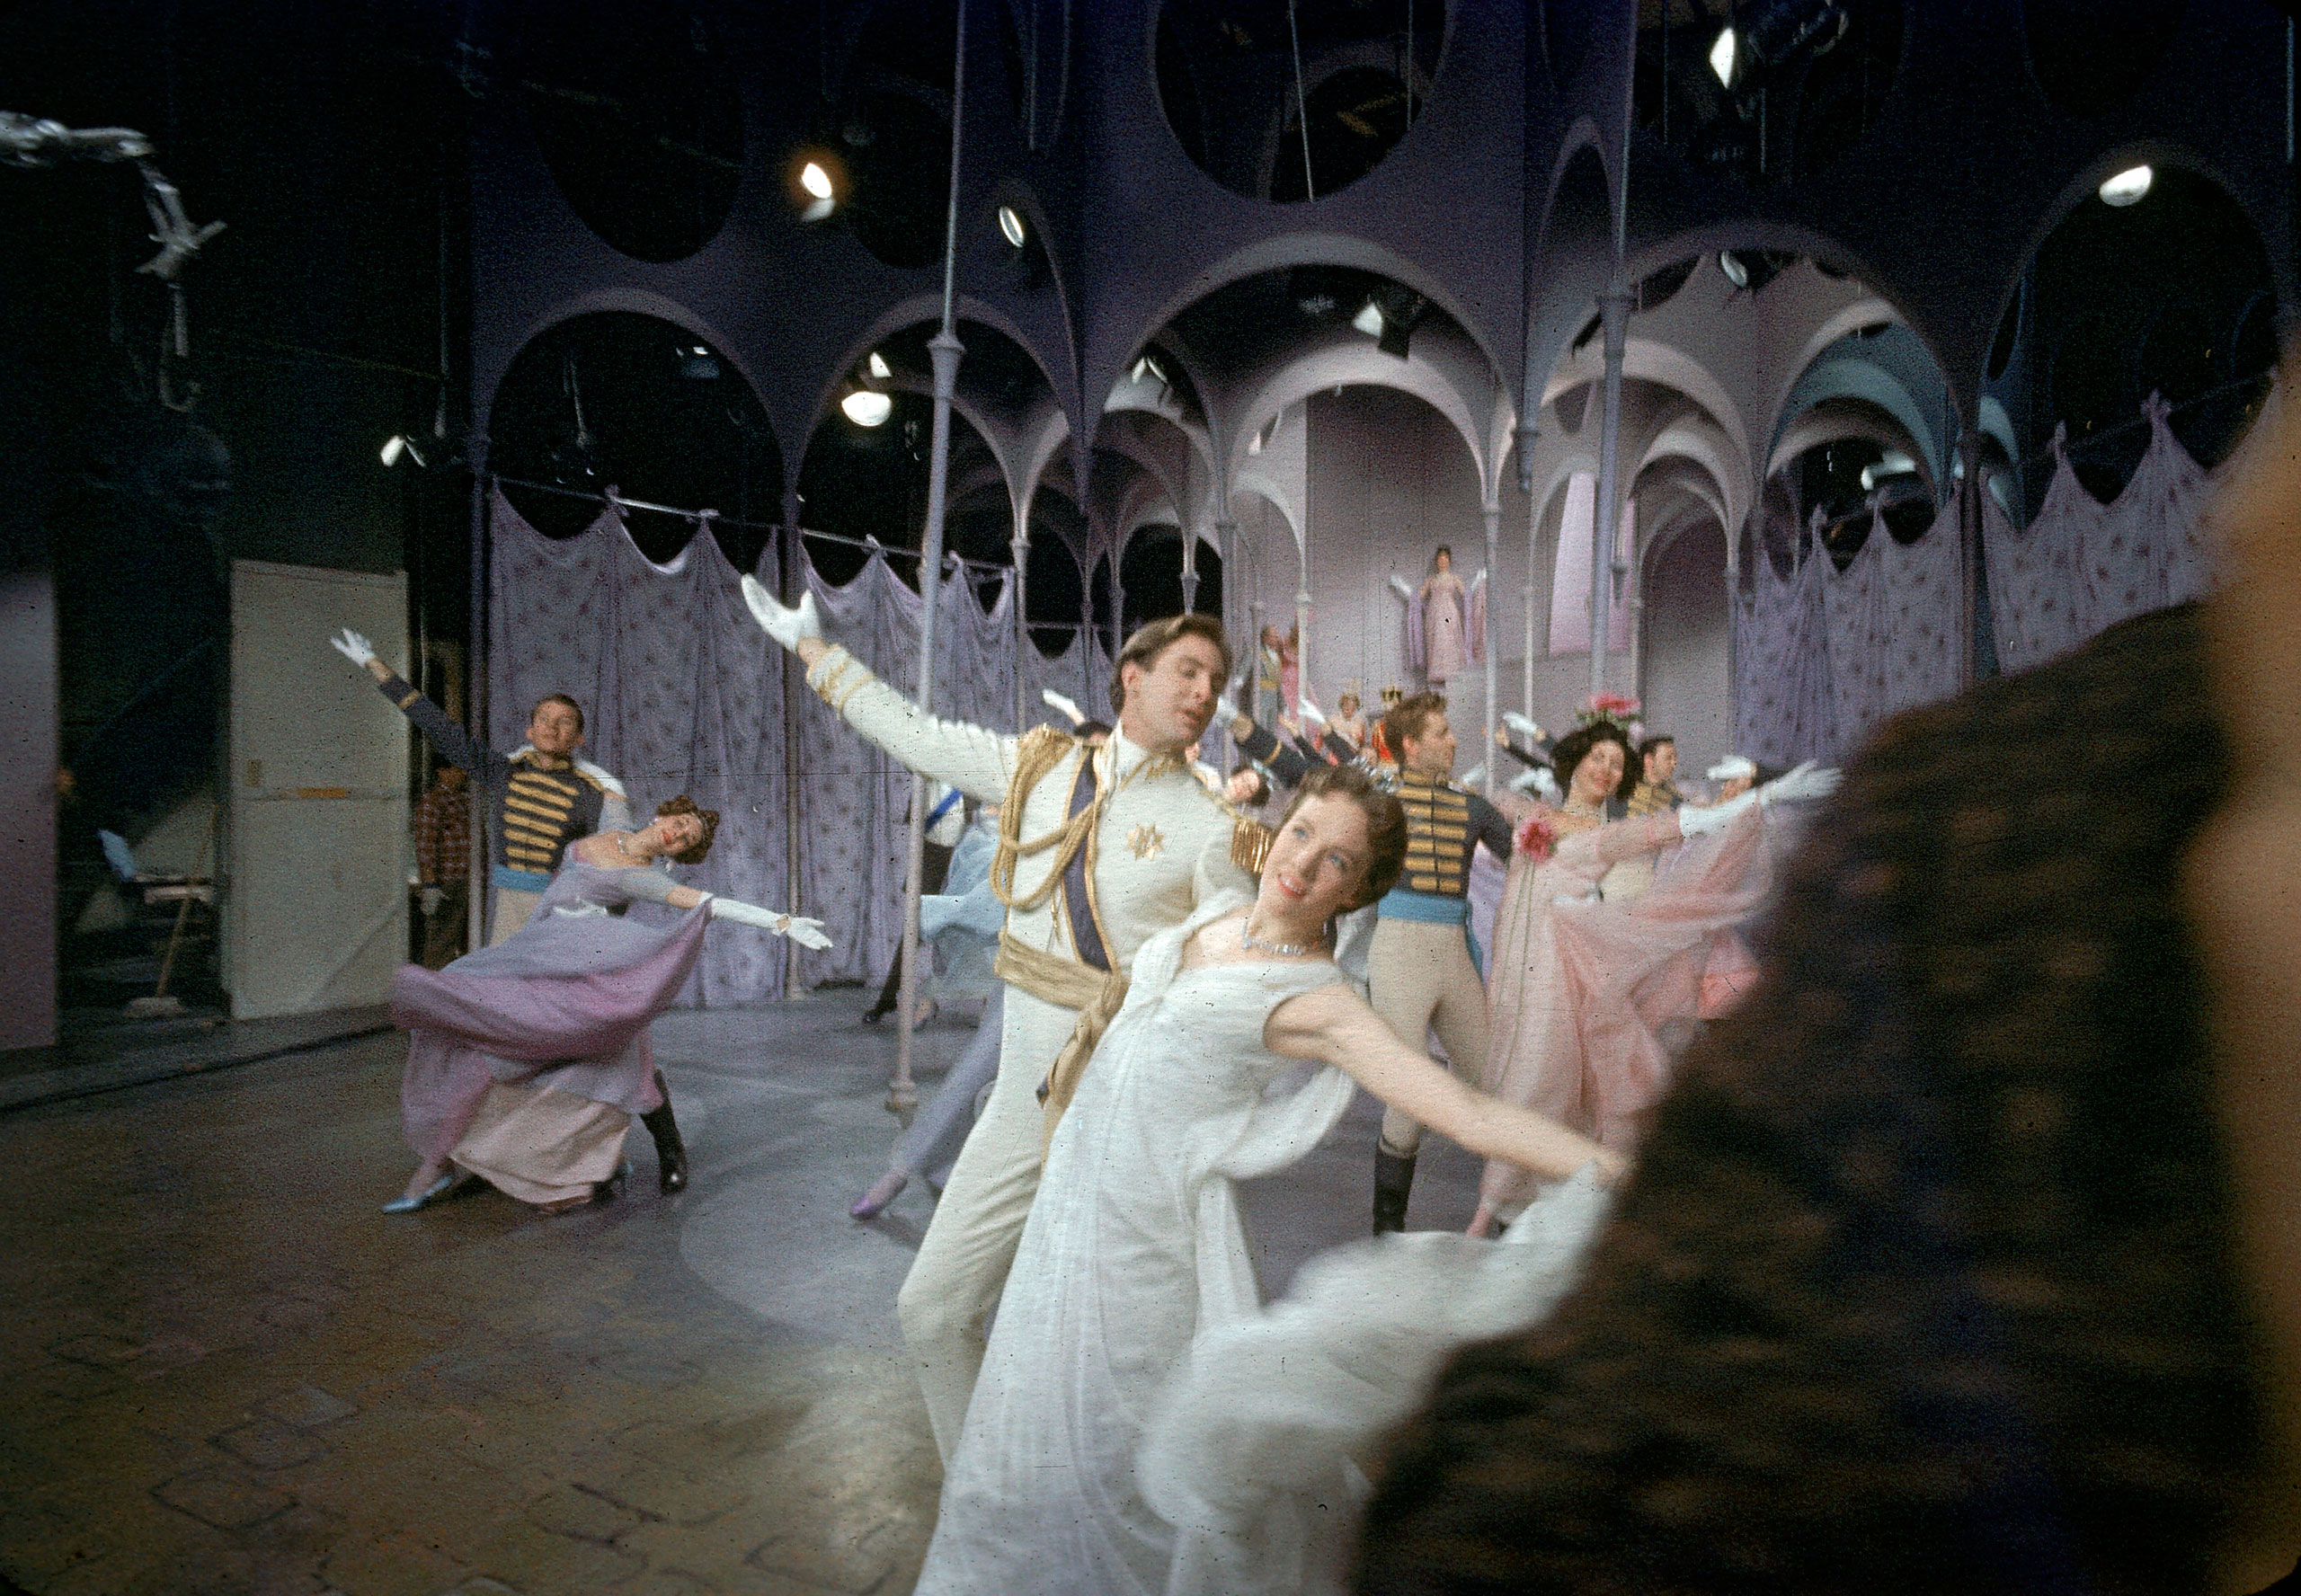 A scene from Cinderella.